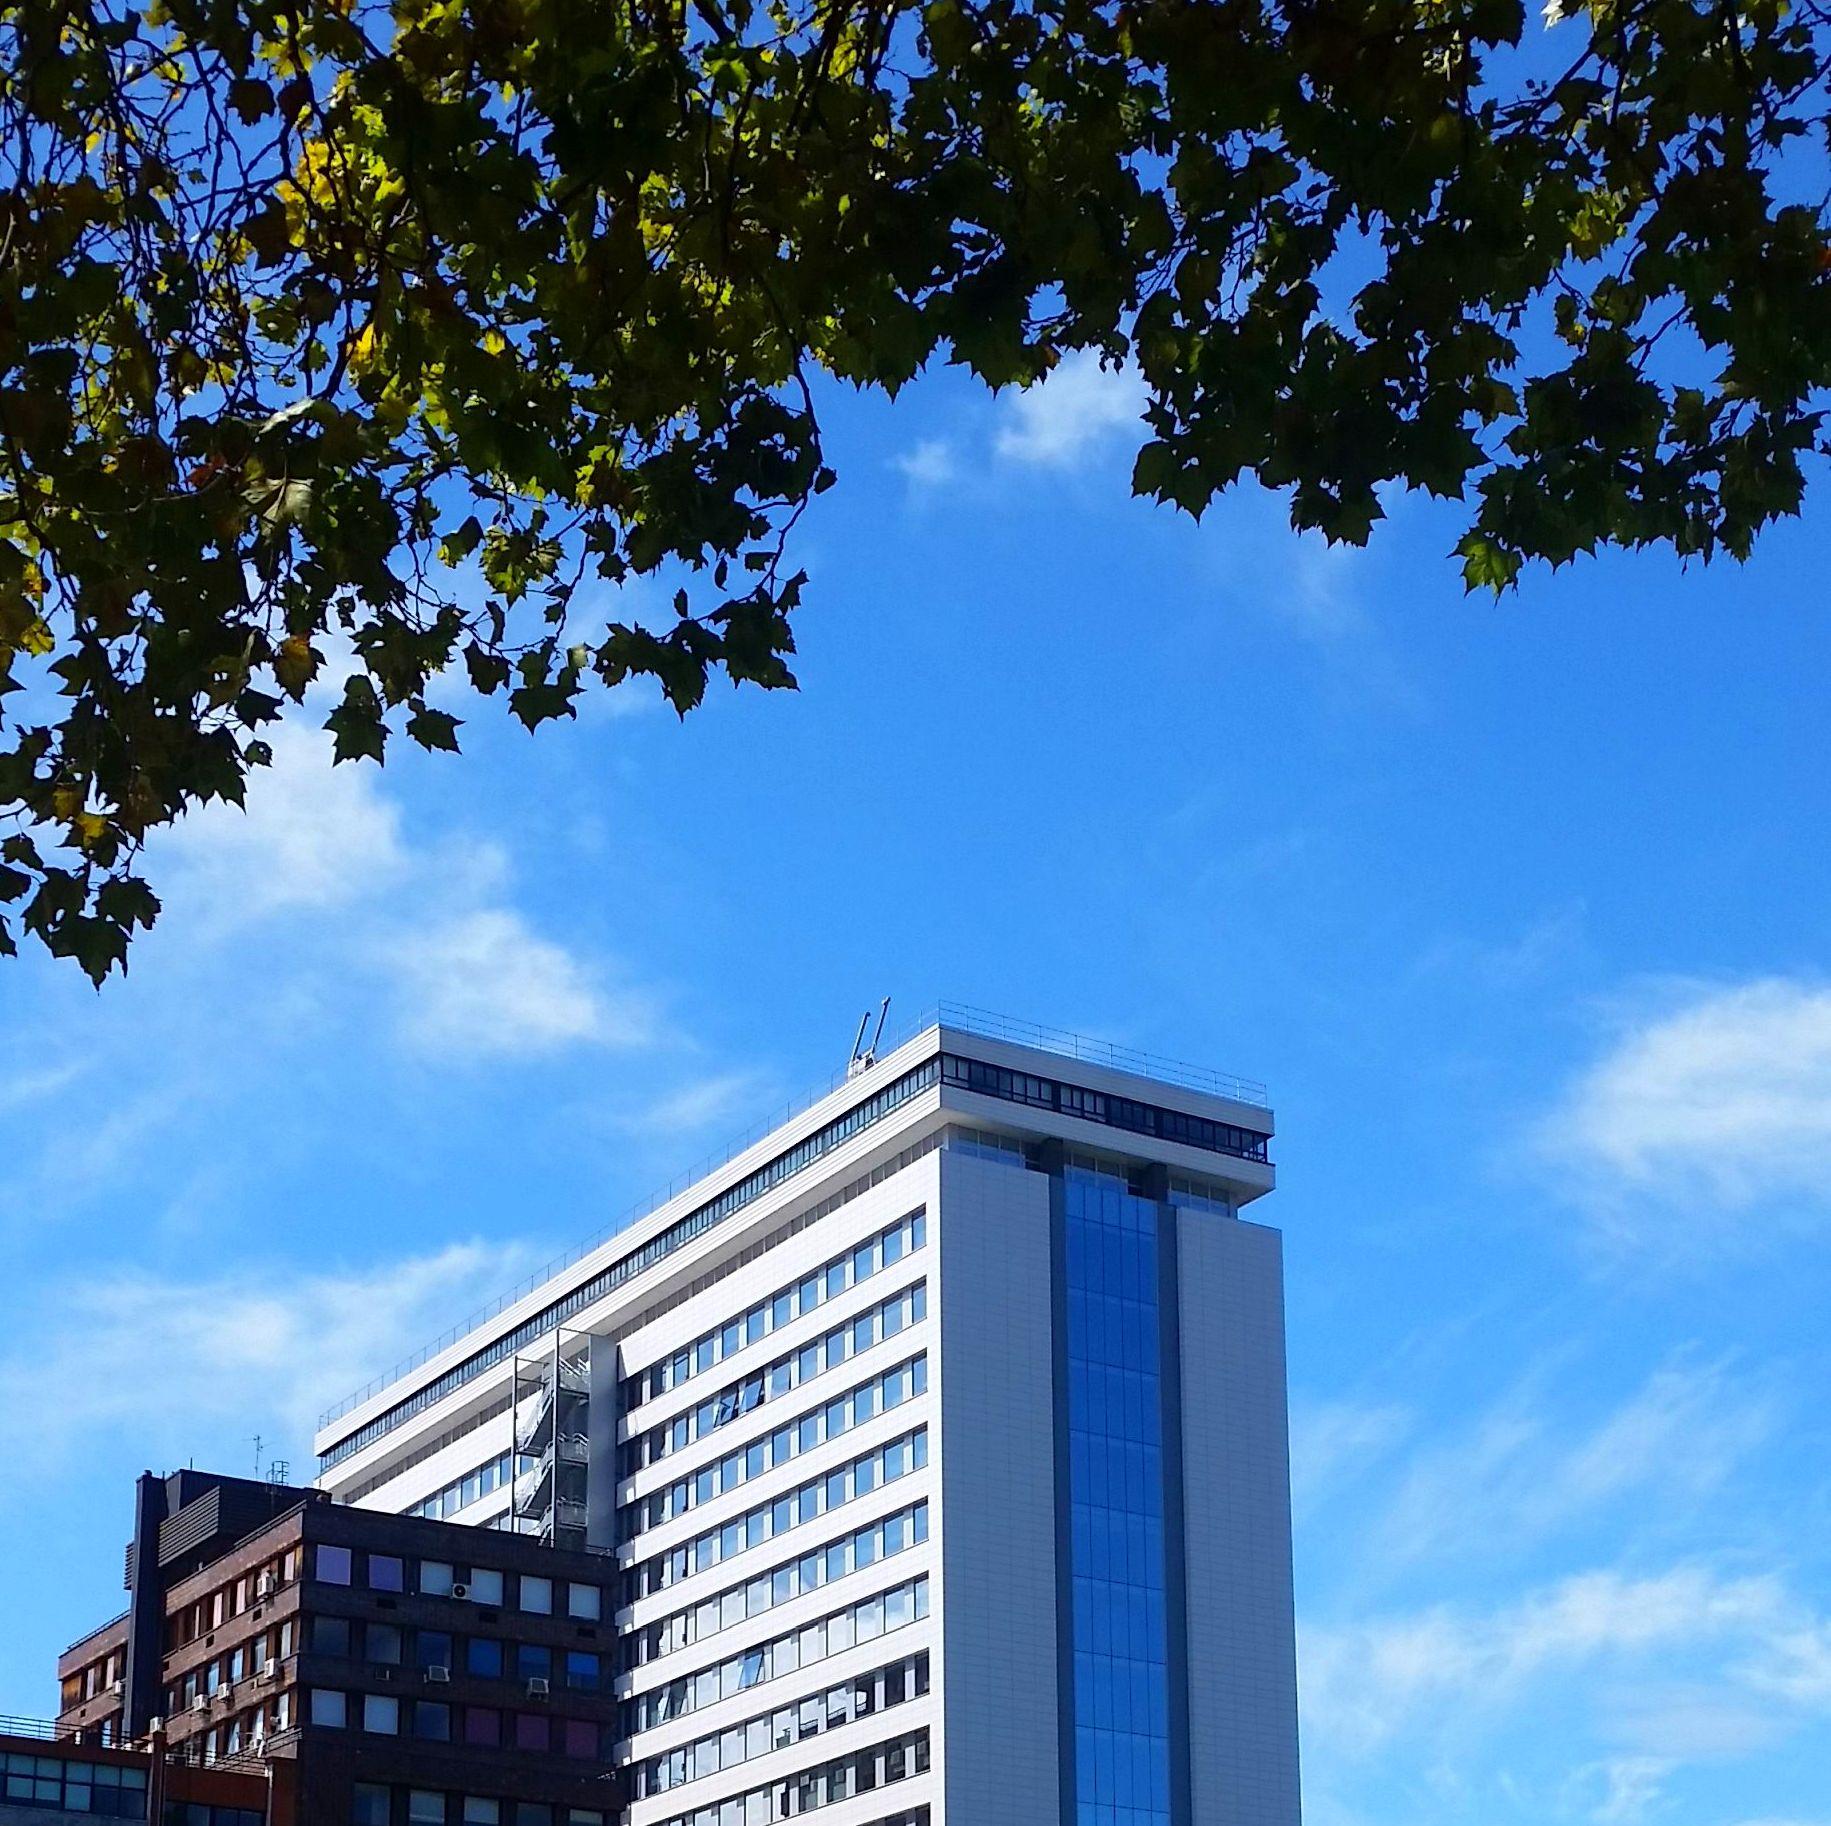 Bilbao oficinas en Edificio Albia